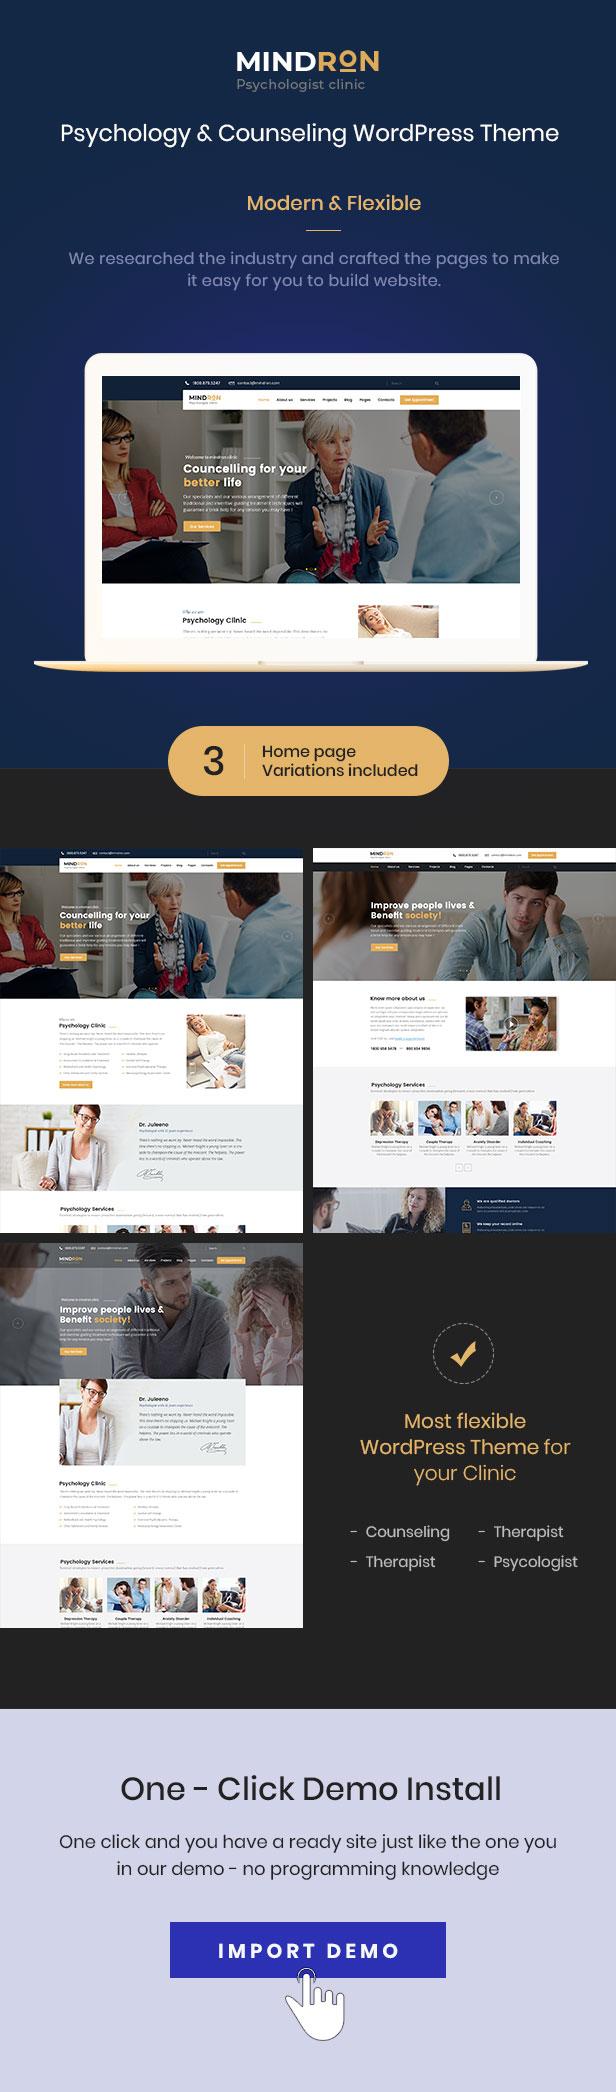 Mindron - Psychologie & Beratung WordPress Theme - 1